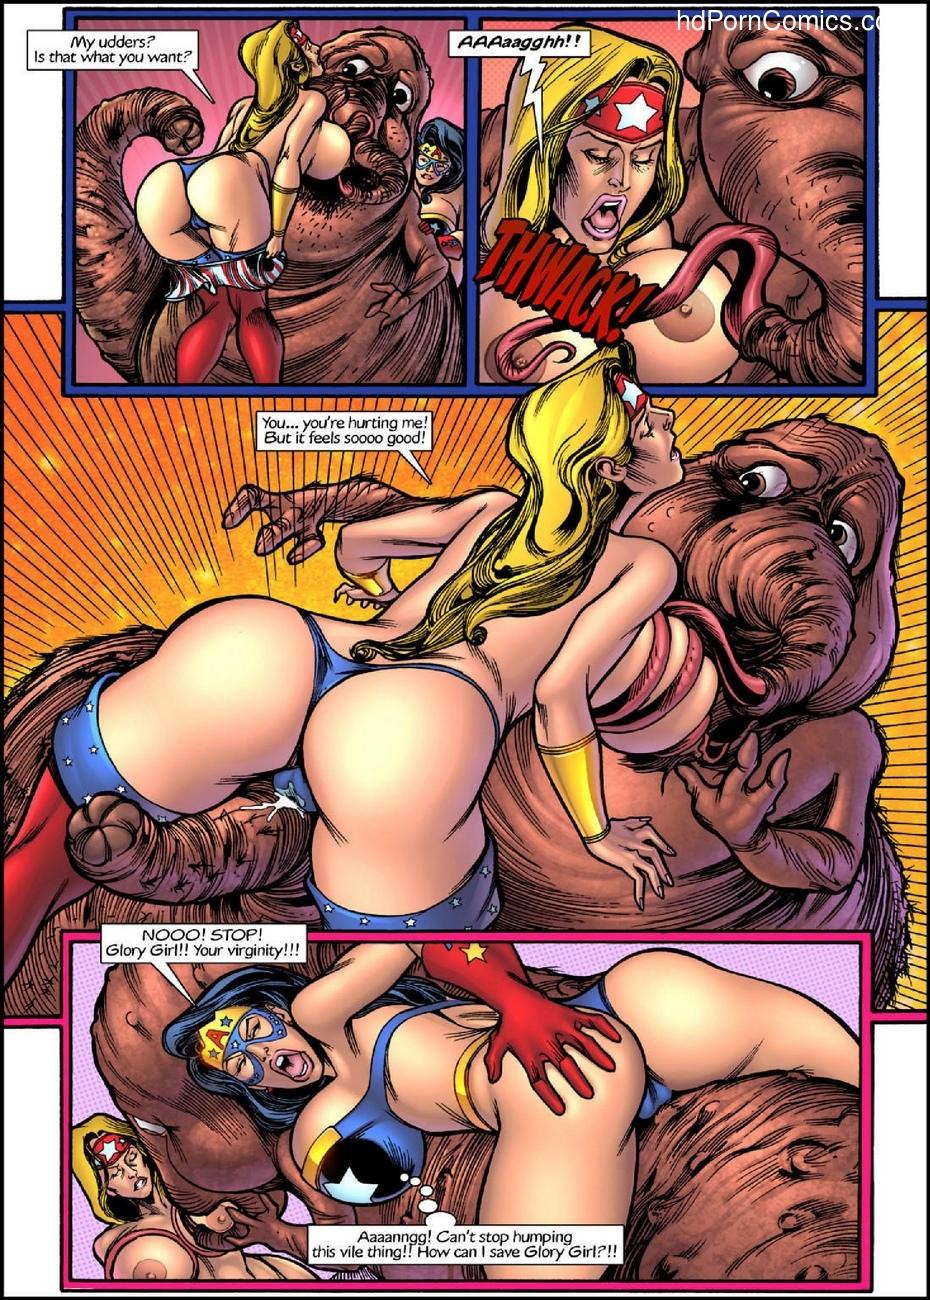 Freedom Stars - Cattle Call 1 52 free sex comic